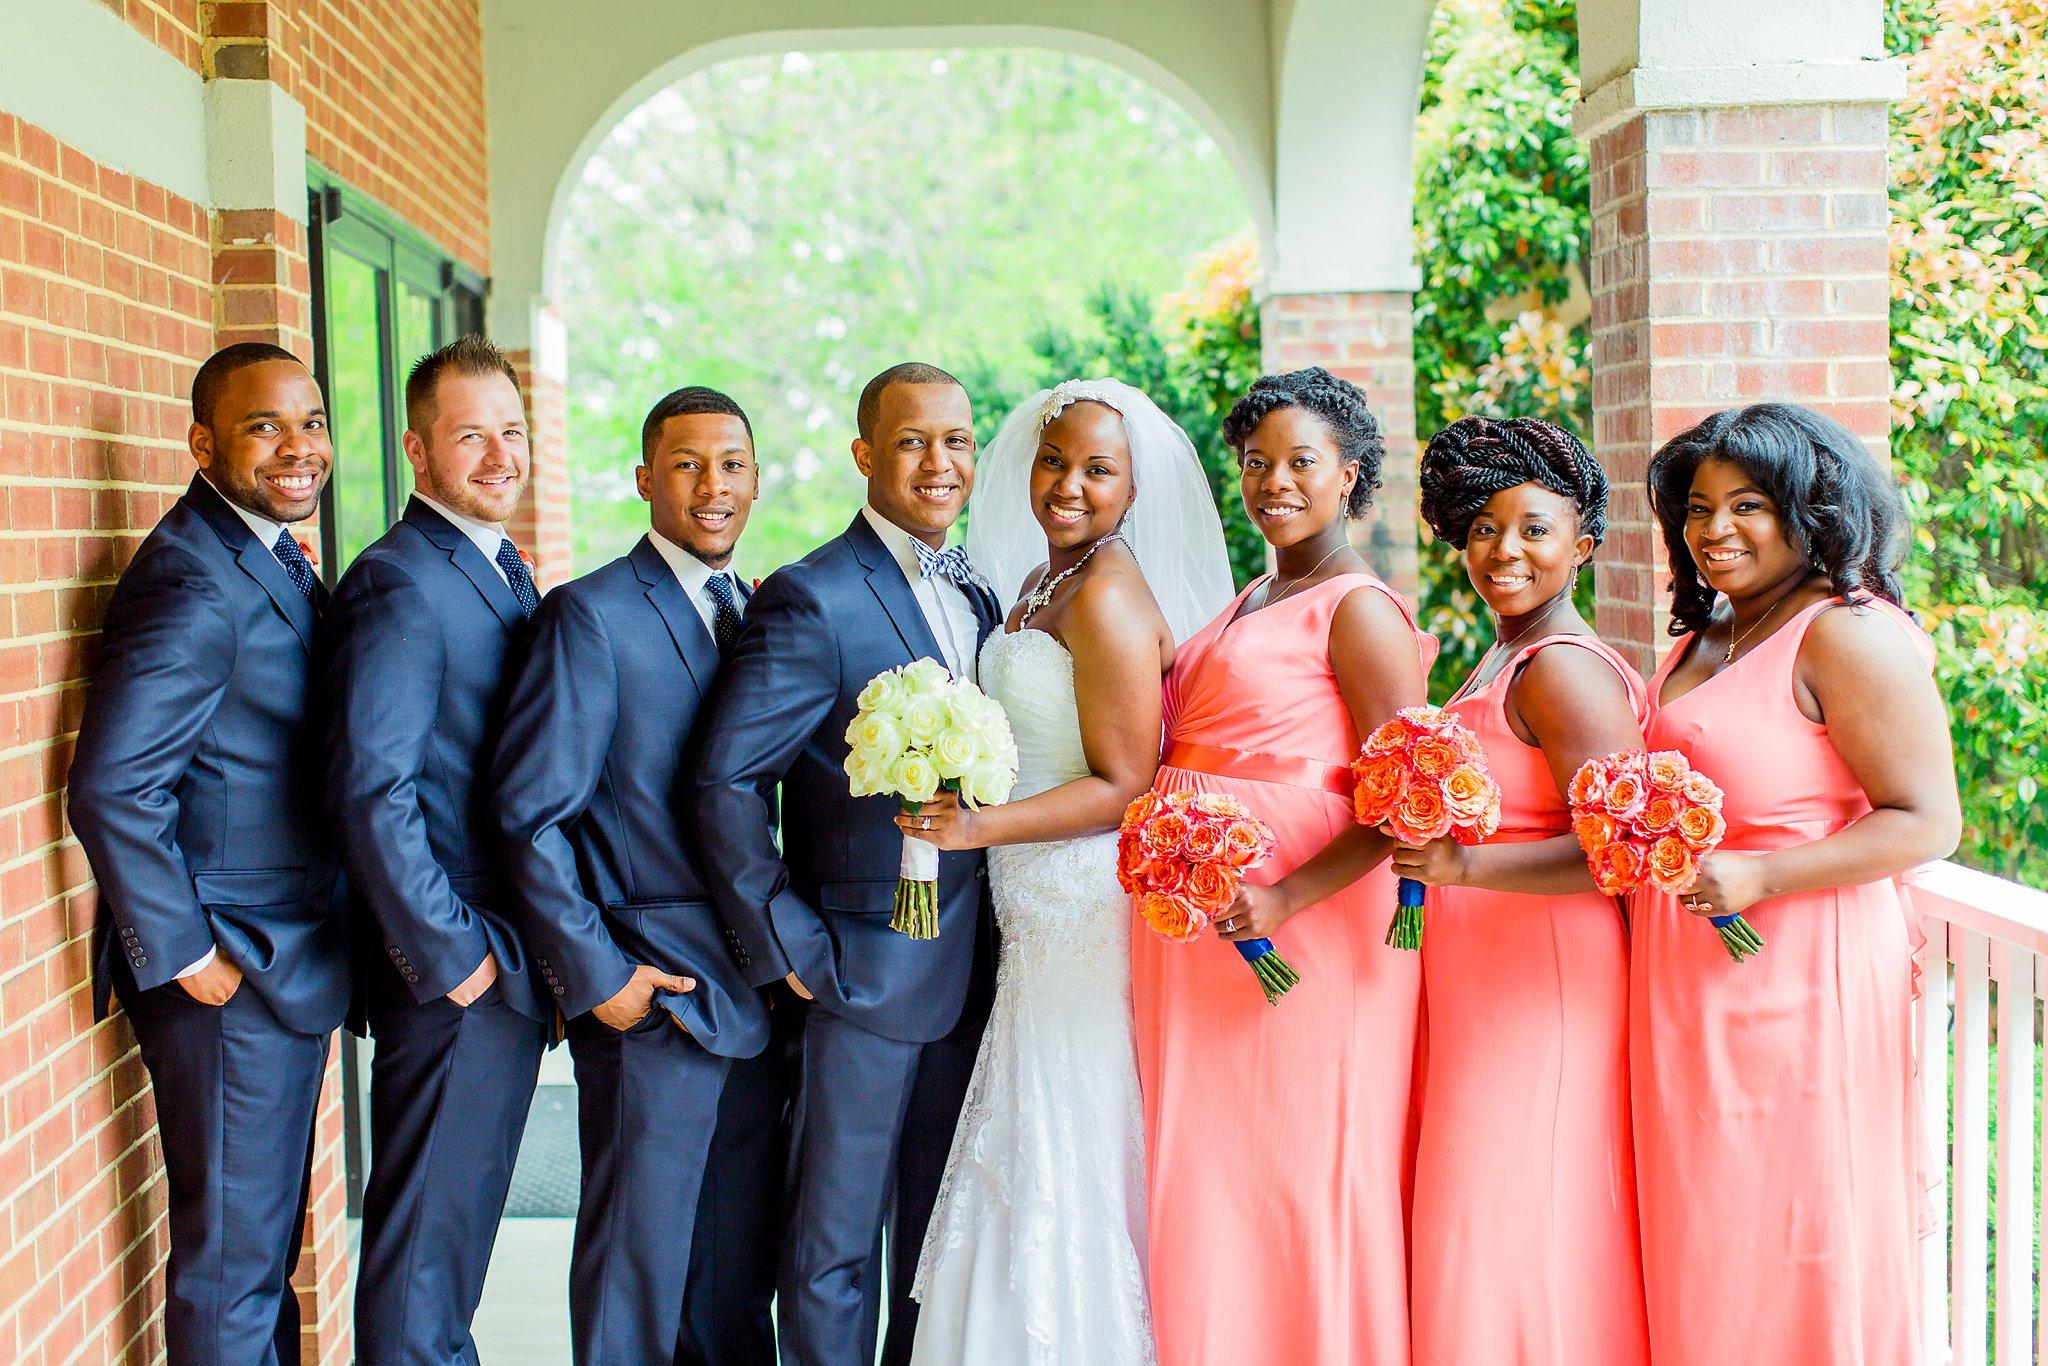 Waterford Springfield Wedding Photography Dyanna & Brian Megan Kelsey Photography-366.jpg